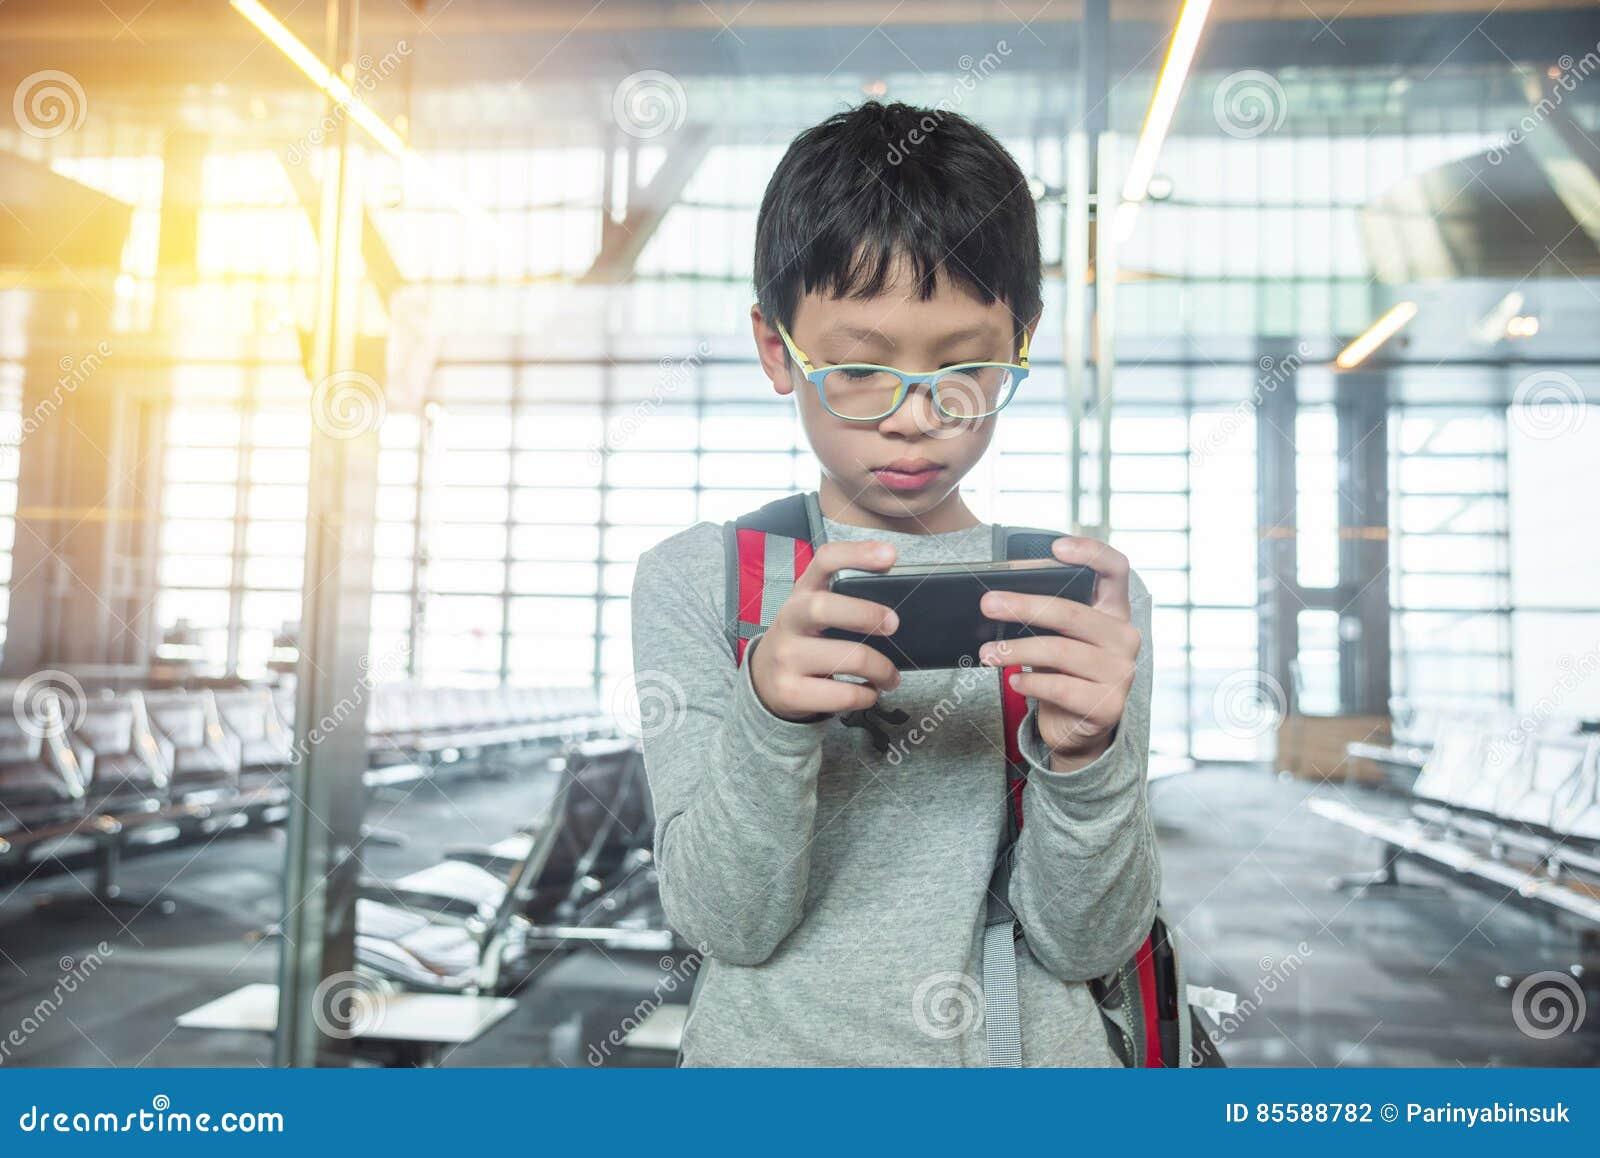 Spiele Am Telefon